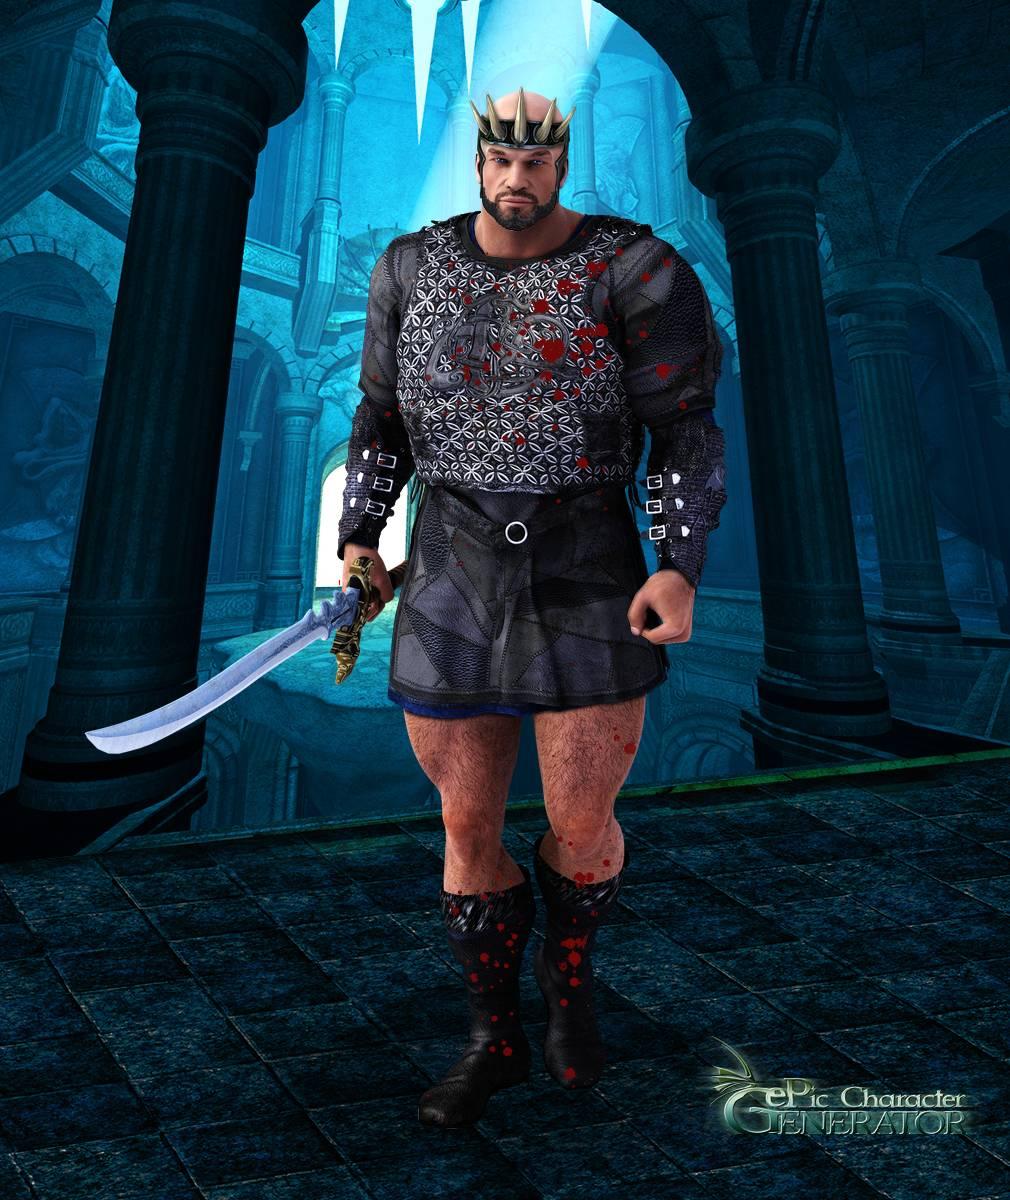 ePic Character Generator Season 2 Muscular Barbarian Screenshot 03